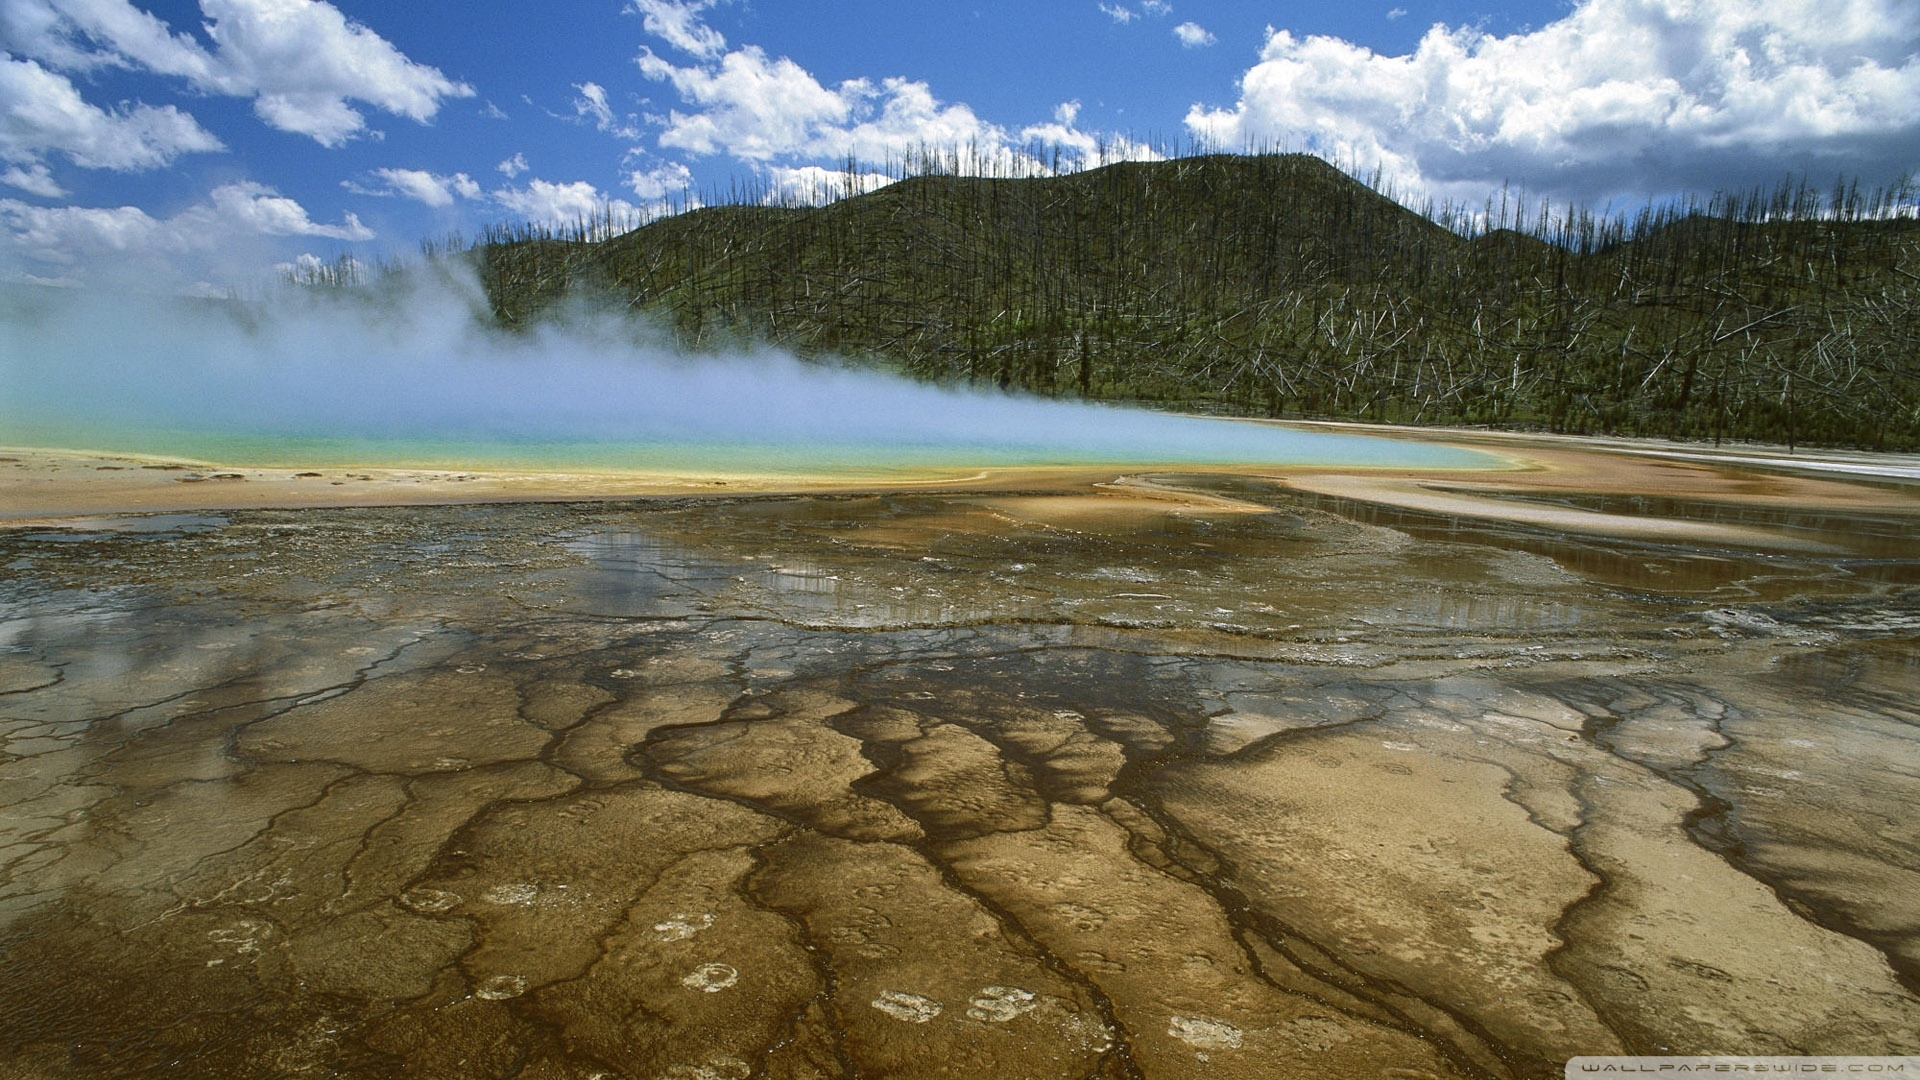 American Bison Yellowstone National Park Montana Wallpaper 1920x1080 1920x1080